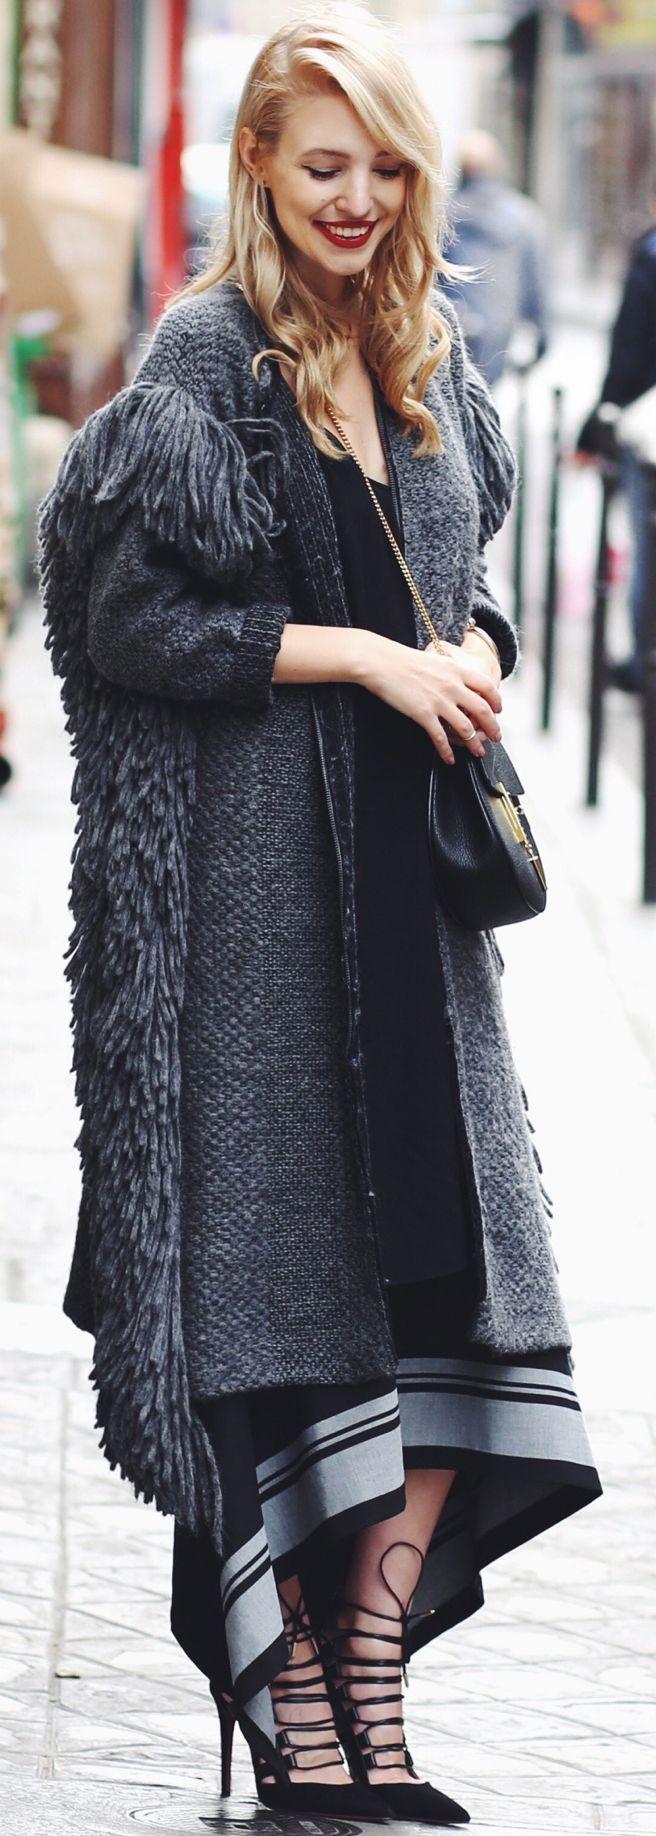 Ooh Couture Chunky Knit Maxi Skirt Fall Inspo #Fashionistas